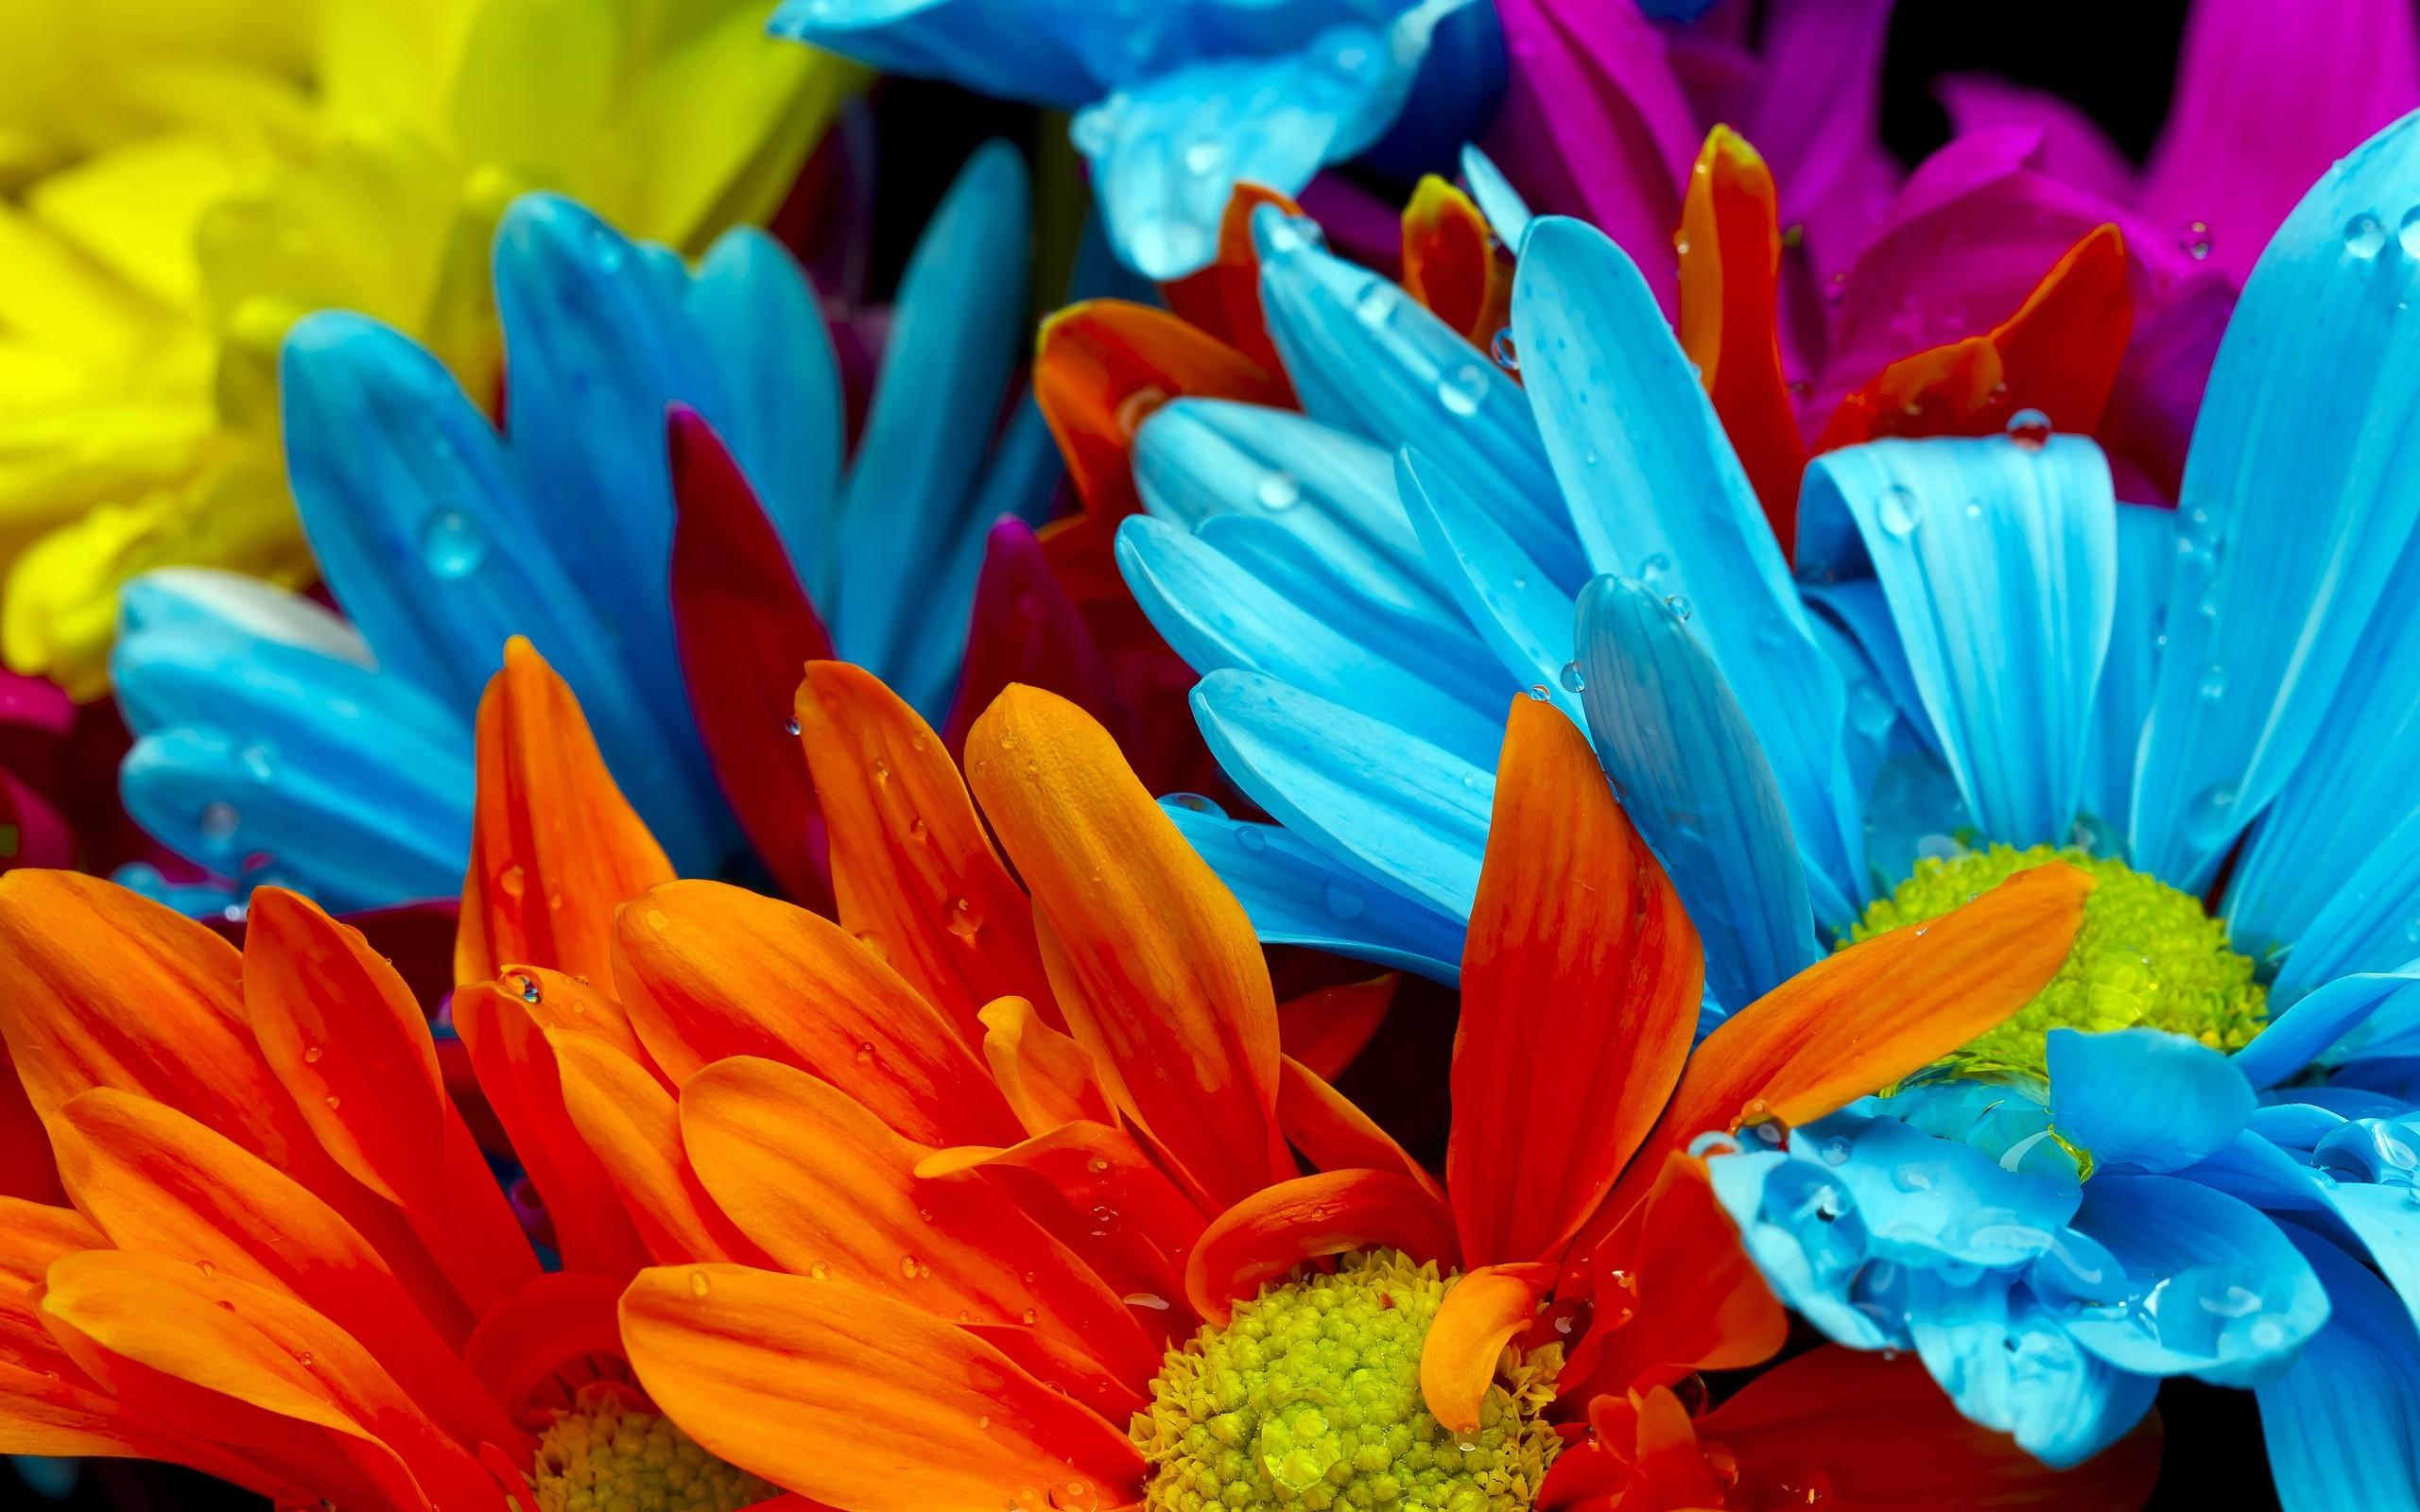 Colorful Flower Wallpaper   Src Amazing Colorful Flower - Colorful Flower Background , HD Wallpaper & Backgrounds